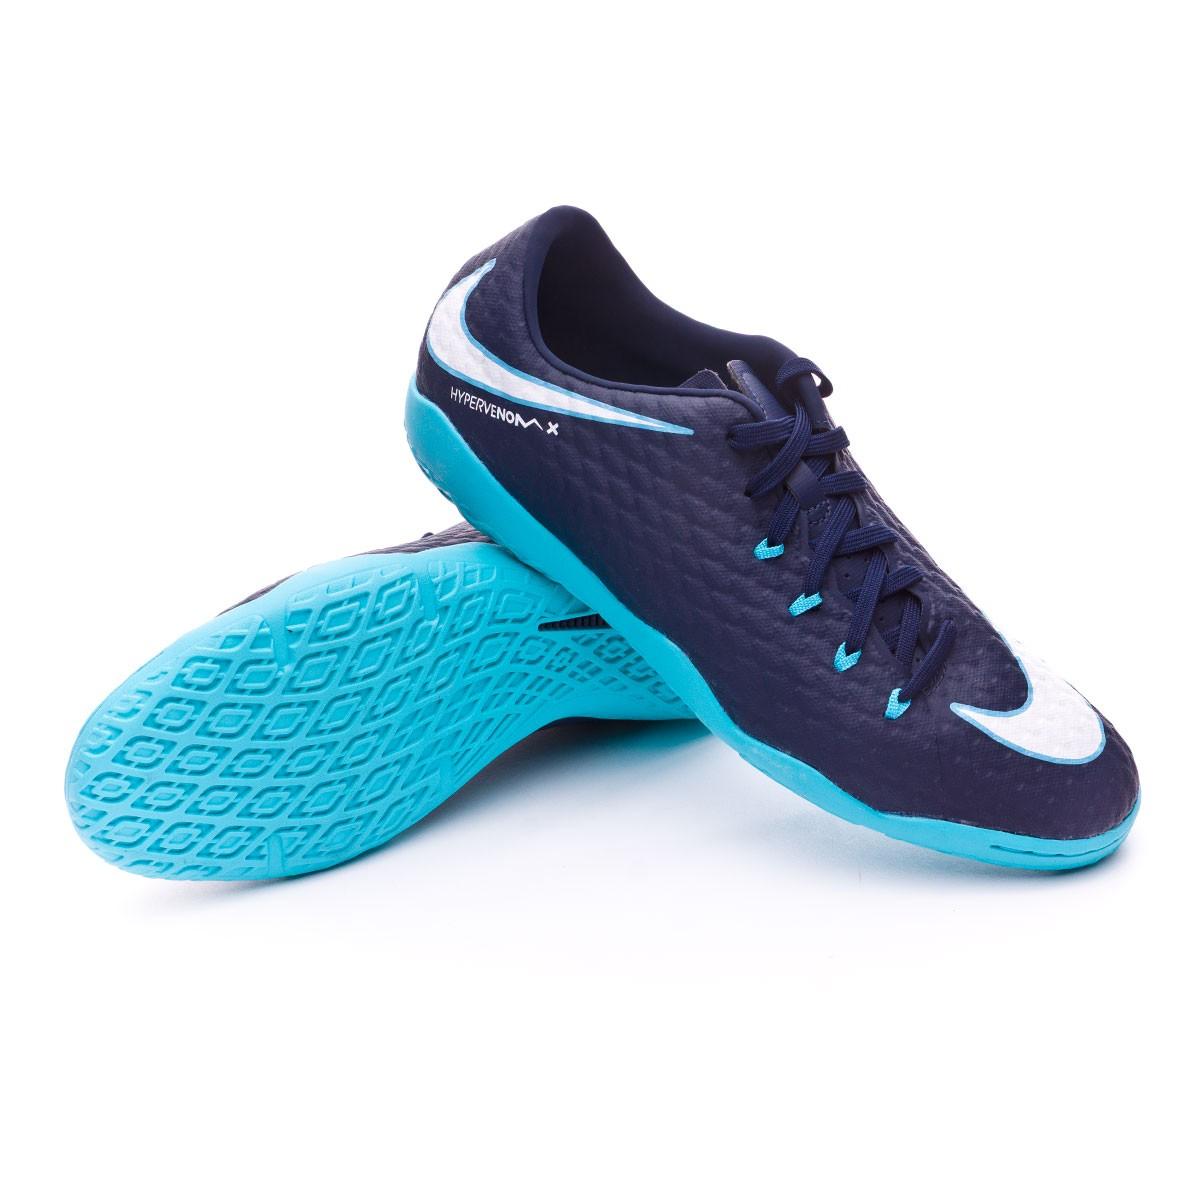 794334bf0 Futsal Boot Nike HypervenomX Phelon III IC Obsidian-White-Gamma blue ...